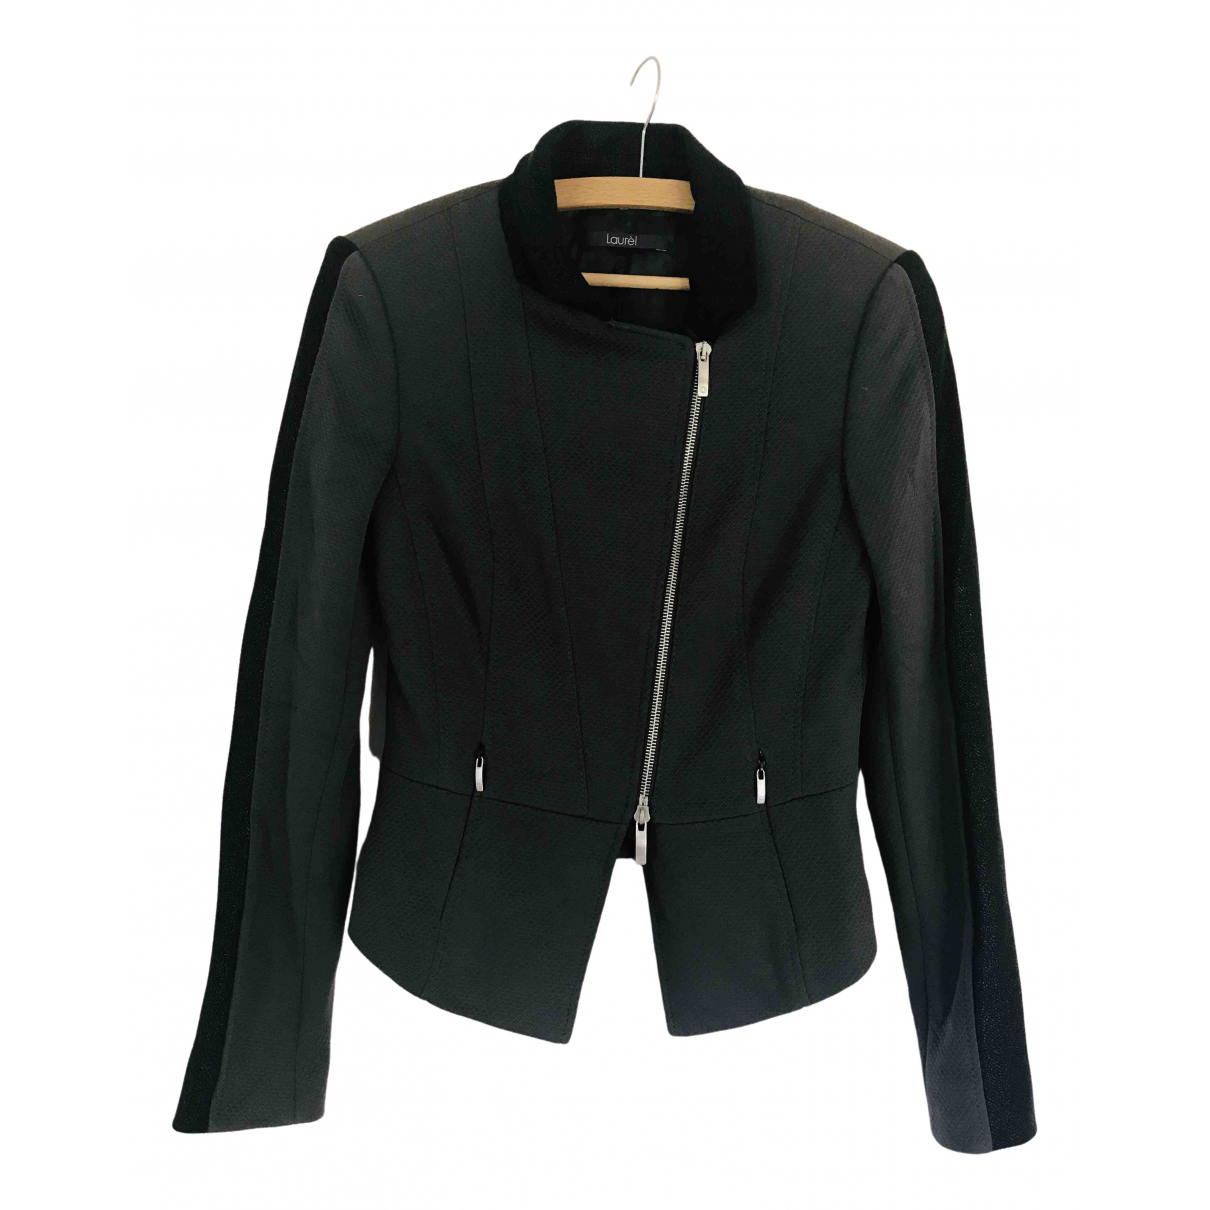 Laurel \N Black jacket for Women 36 IT